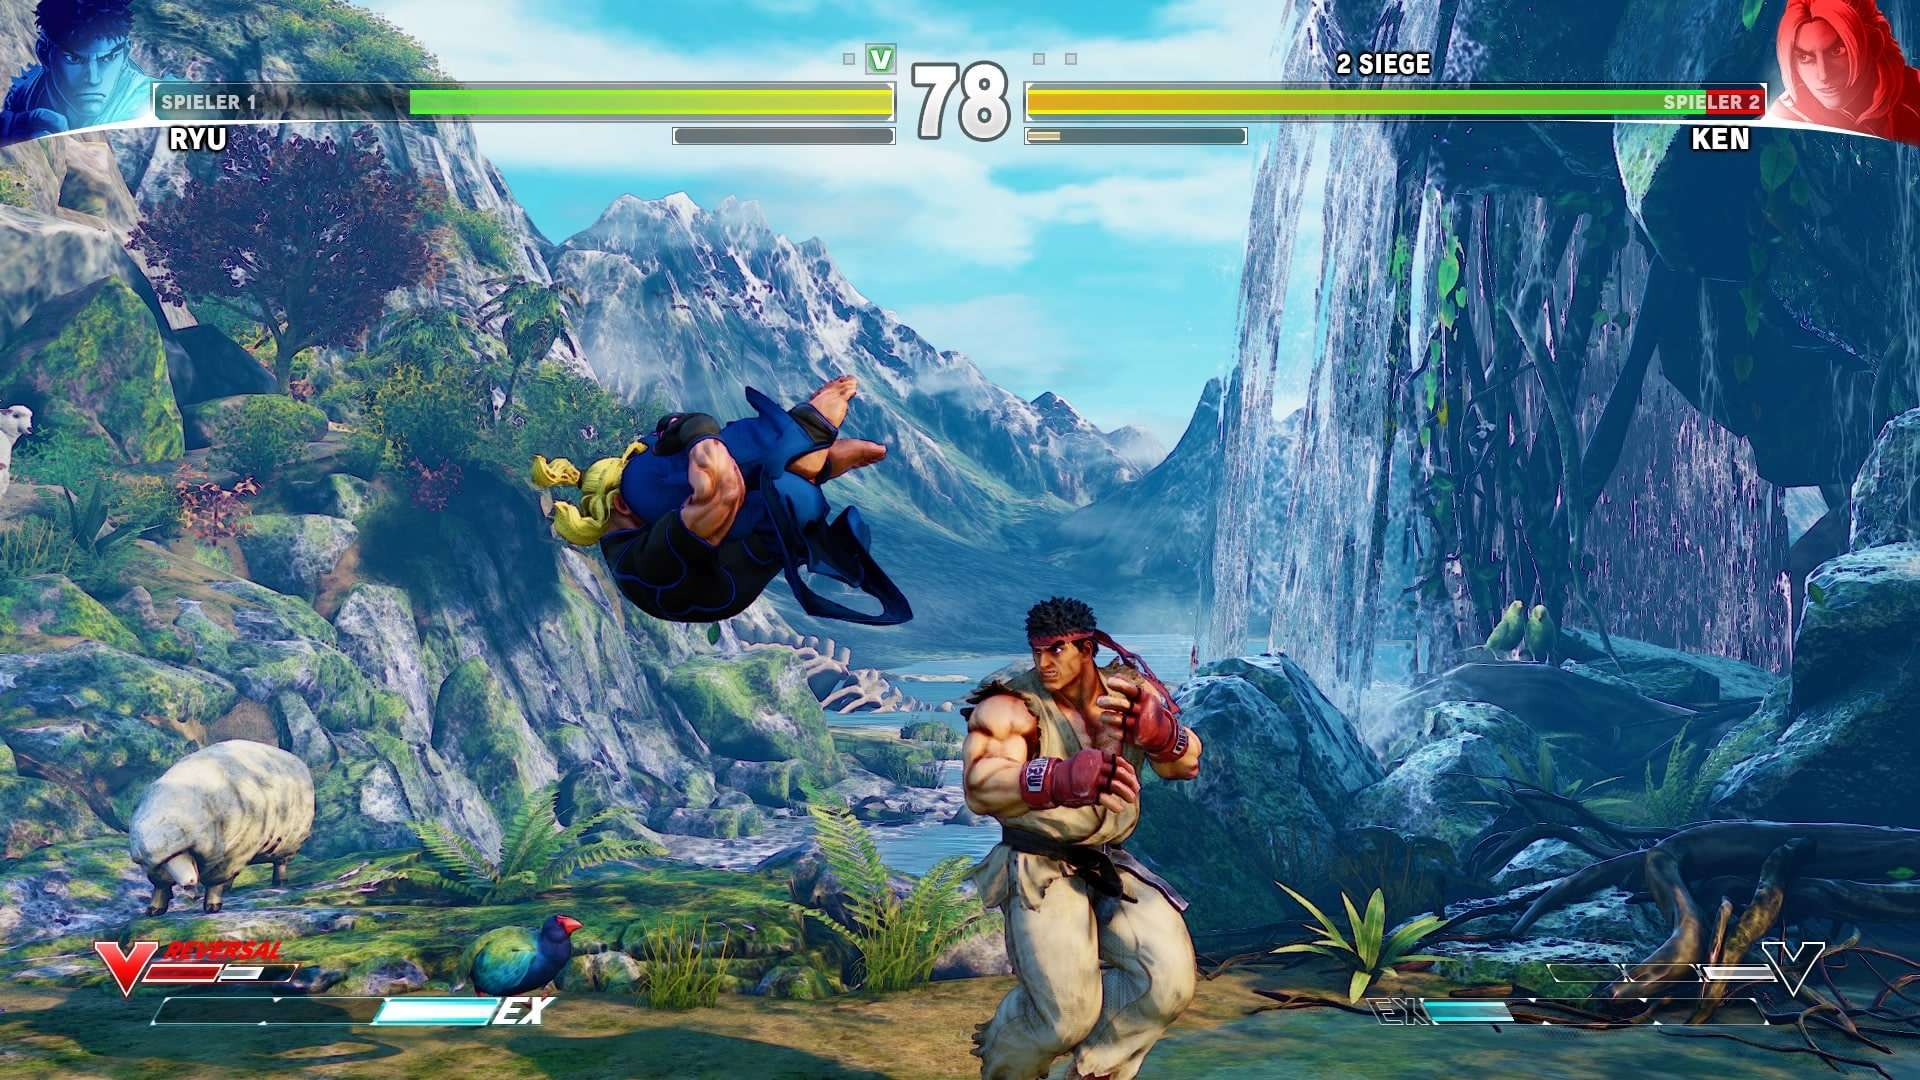 Hadoken strikes again – Street Fighter V (PS4) kurz angespielt 4 techboys.de • smarte News, auf den Punkt! Hadoken strikes again – Street Fighter V (PS4) kurz angespielt